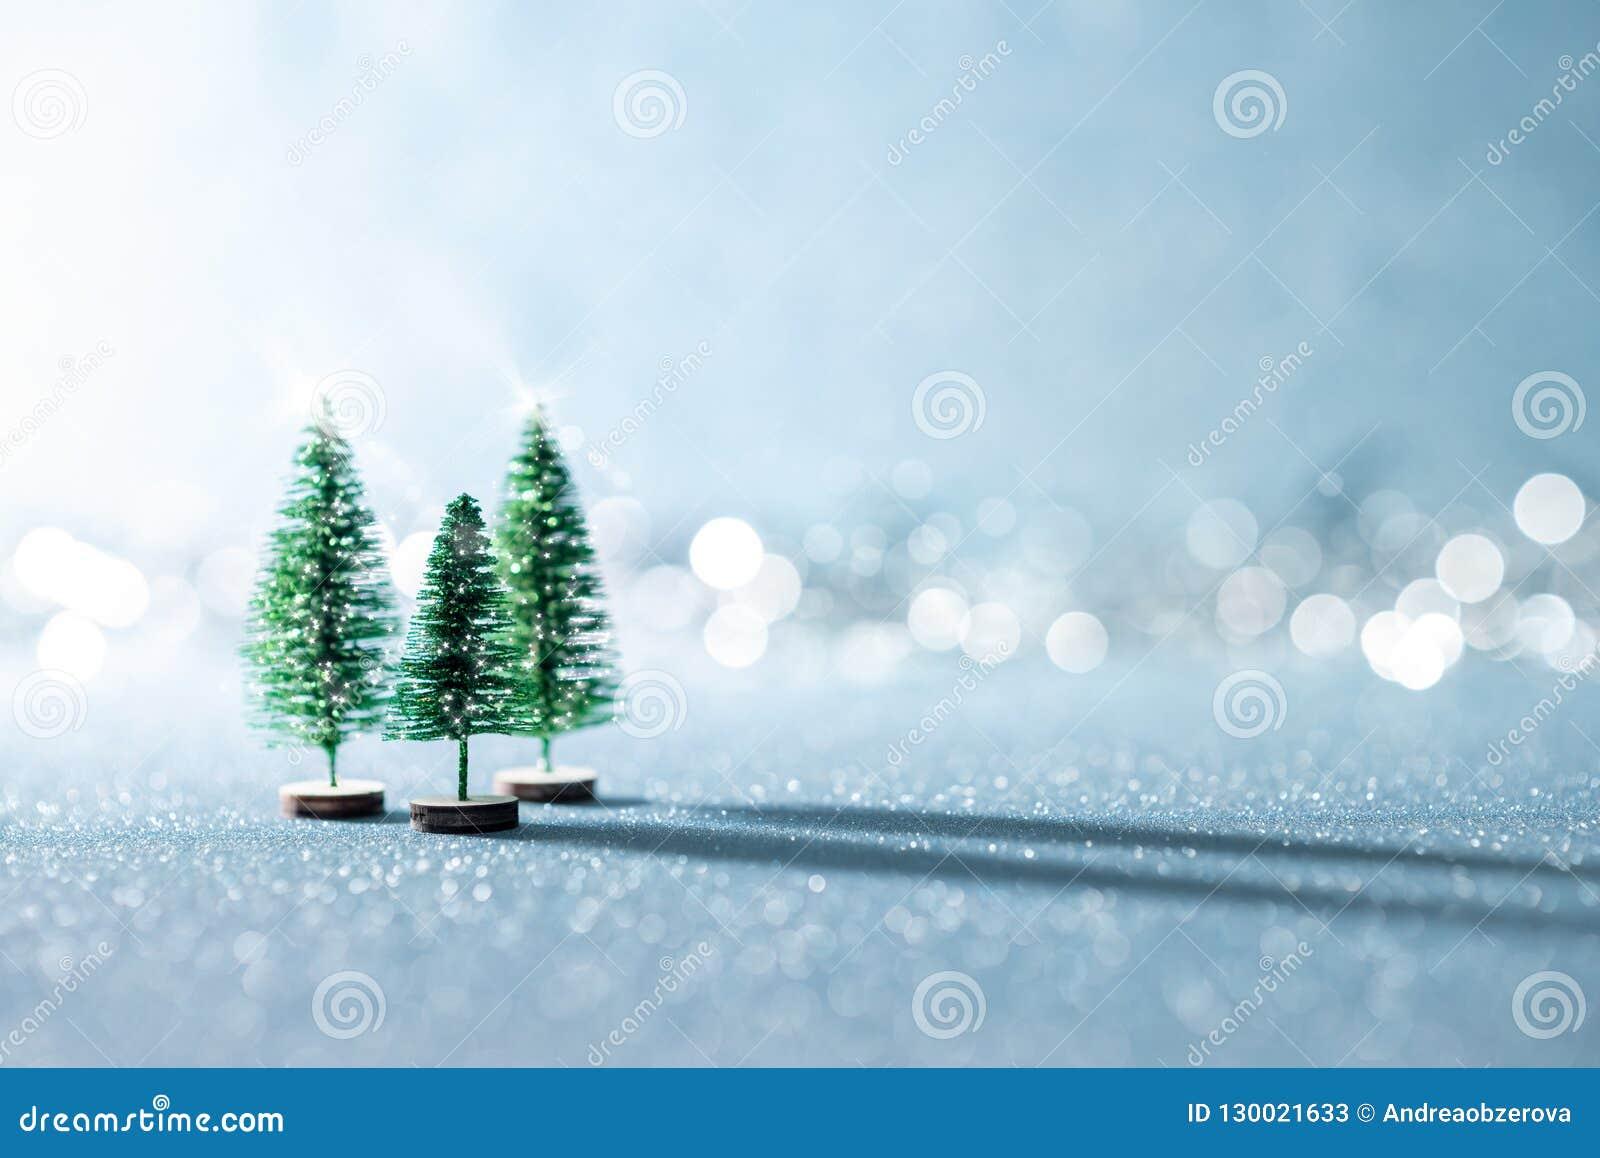 Magical Miniature Winter Wonderland Background Evergreen Christmas Trees On Shiny Blue Background With Bokeh Stock Image Image Of Festive Lights 130021633